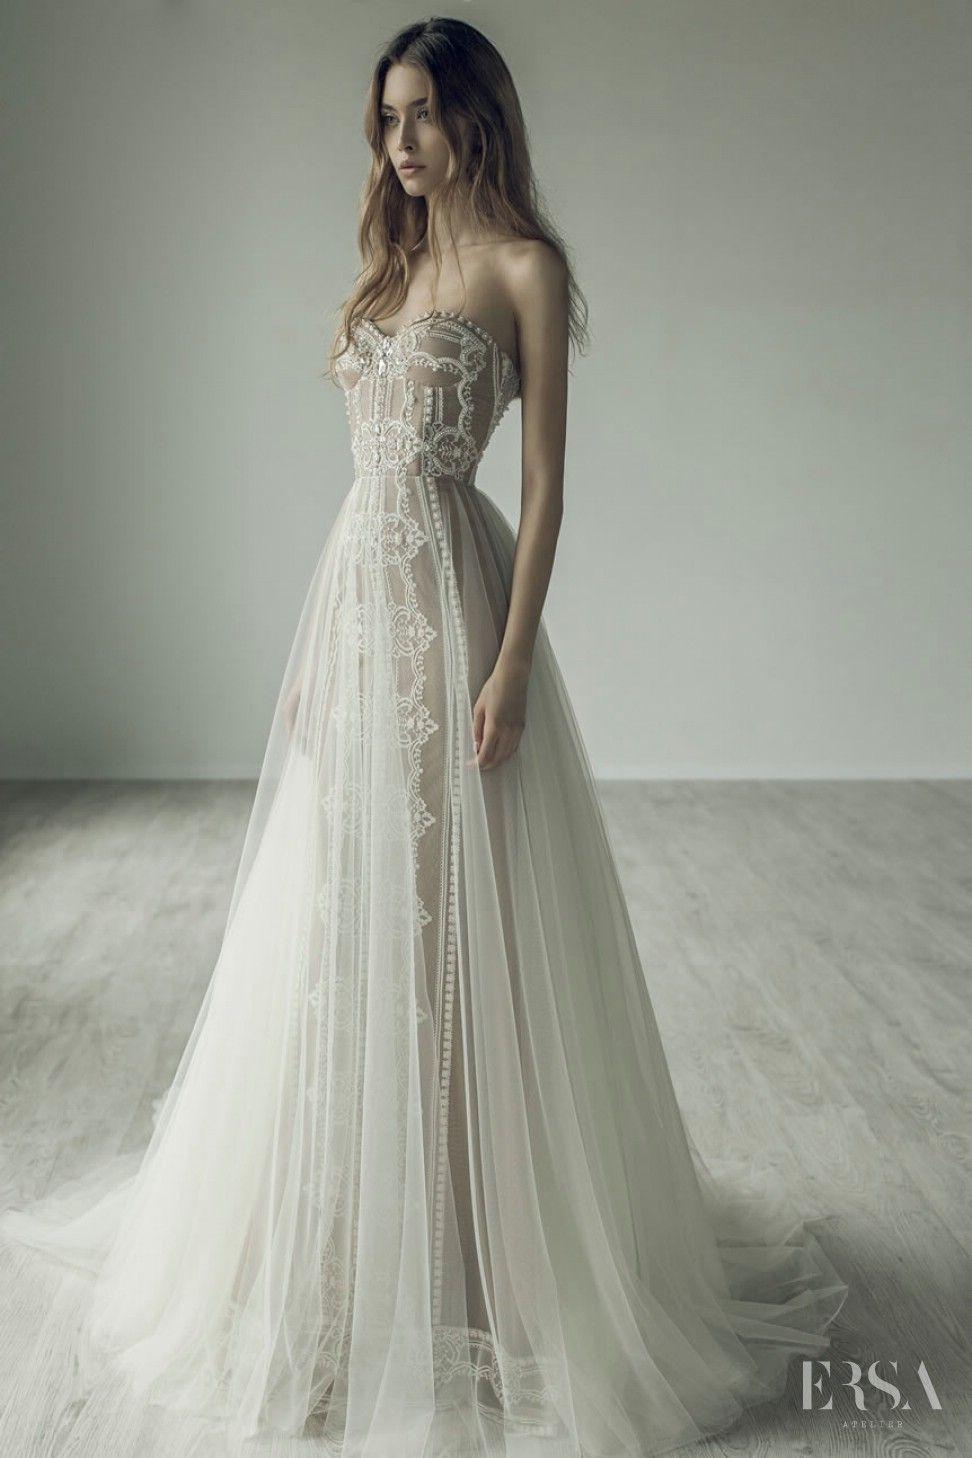 Ersa Atelier Wedding Collection Bridal Dress Bita Here Comes